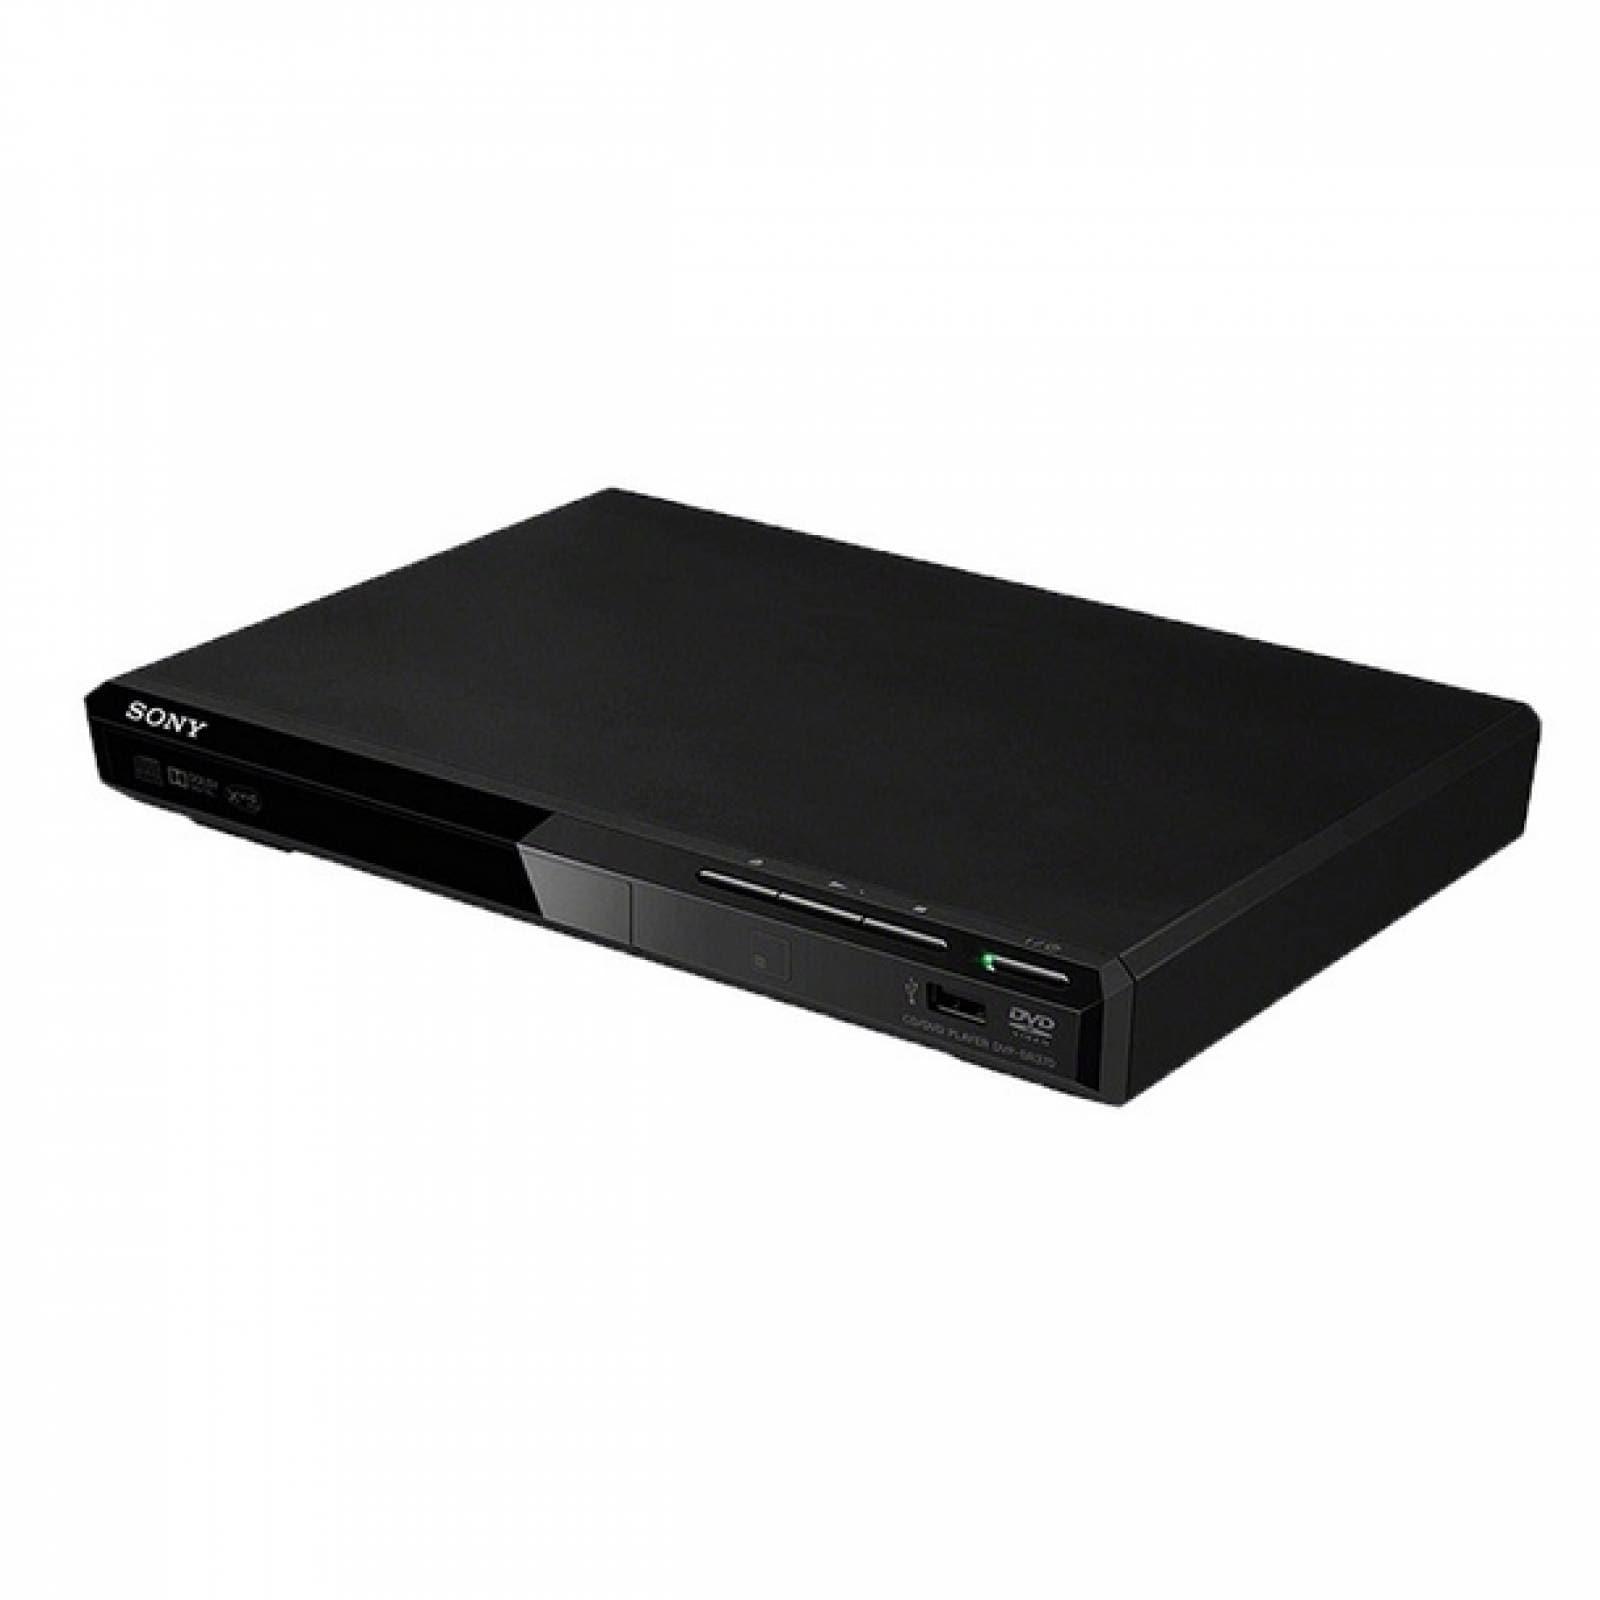 Reproductor Sony DVD  con USB 2.0 DVP-SR370